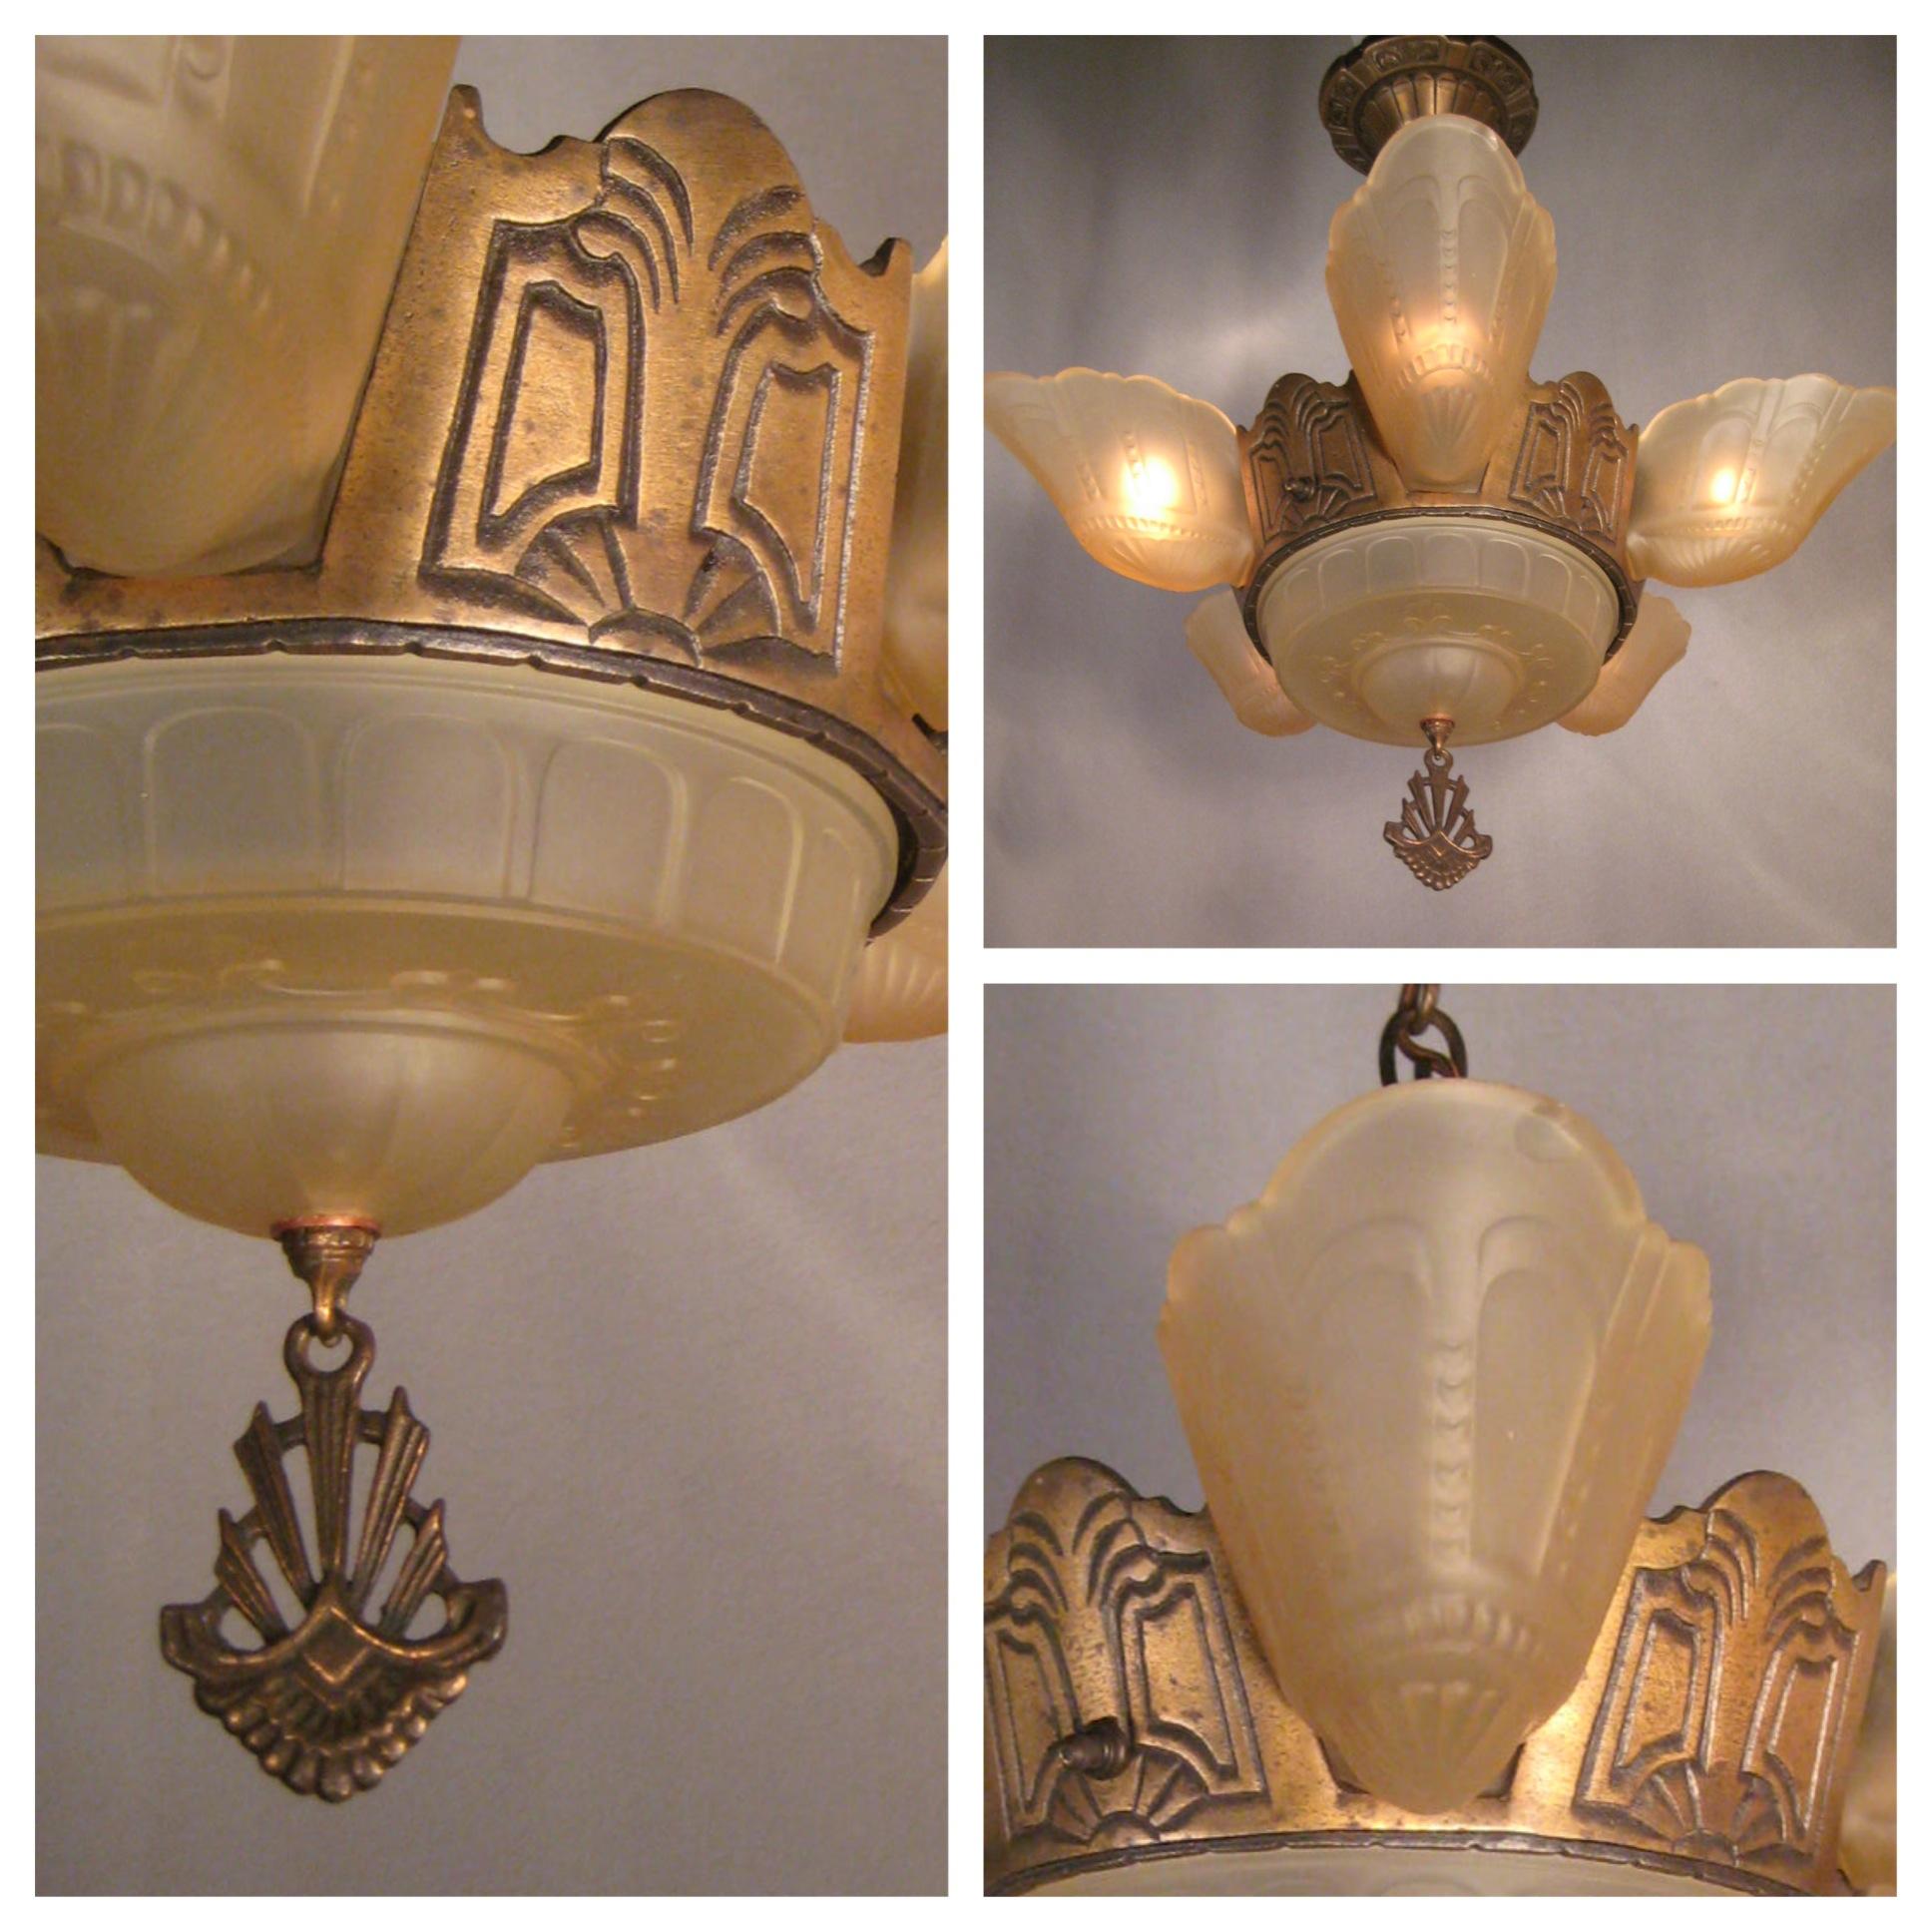 A3647 art deco bronze chandelier with shades bogart bremmer a3647 art deco bronze chandelier with shades arubaitofo Choice Image